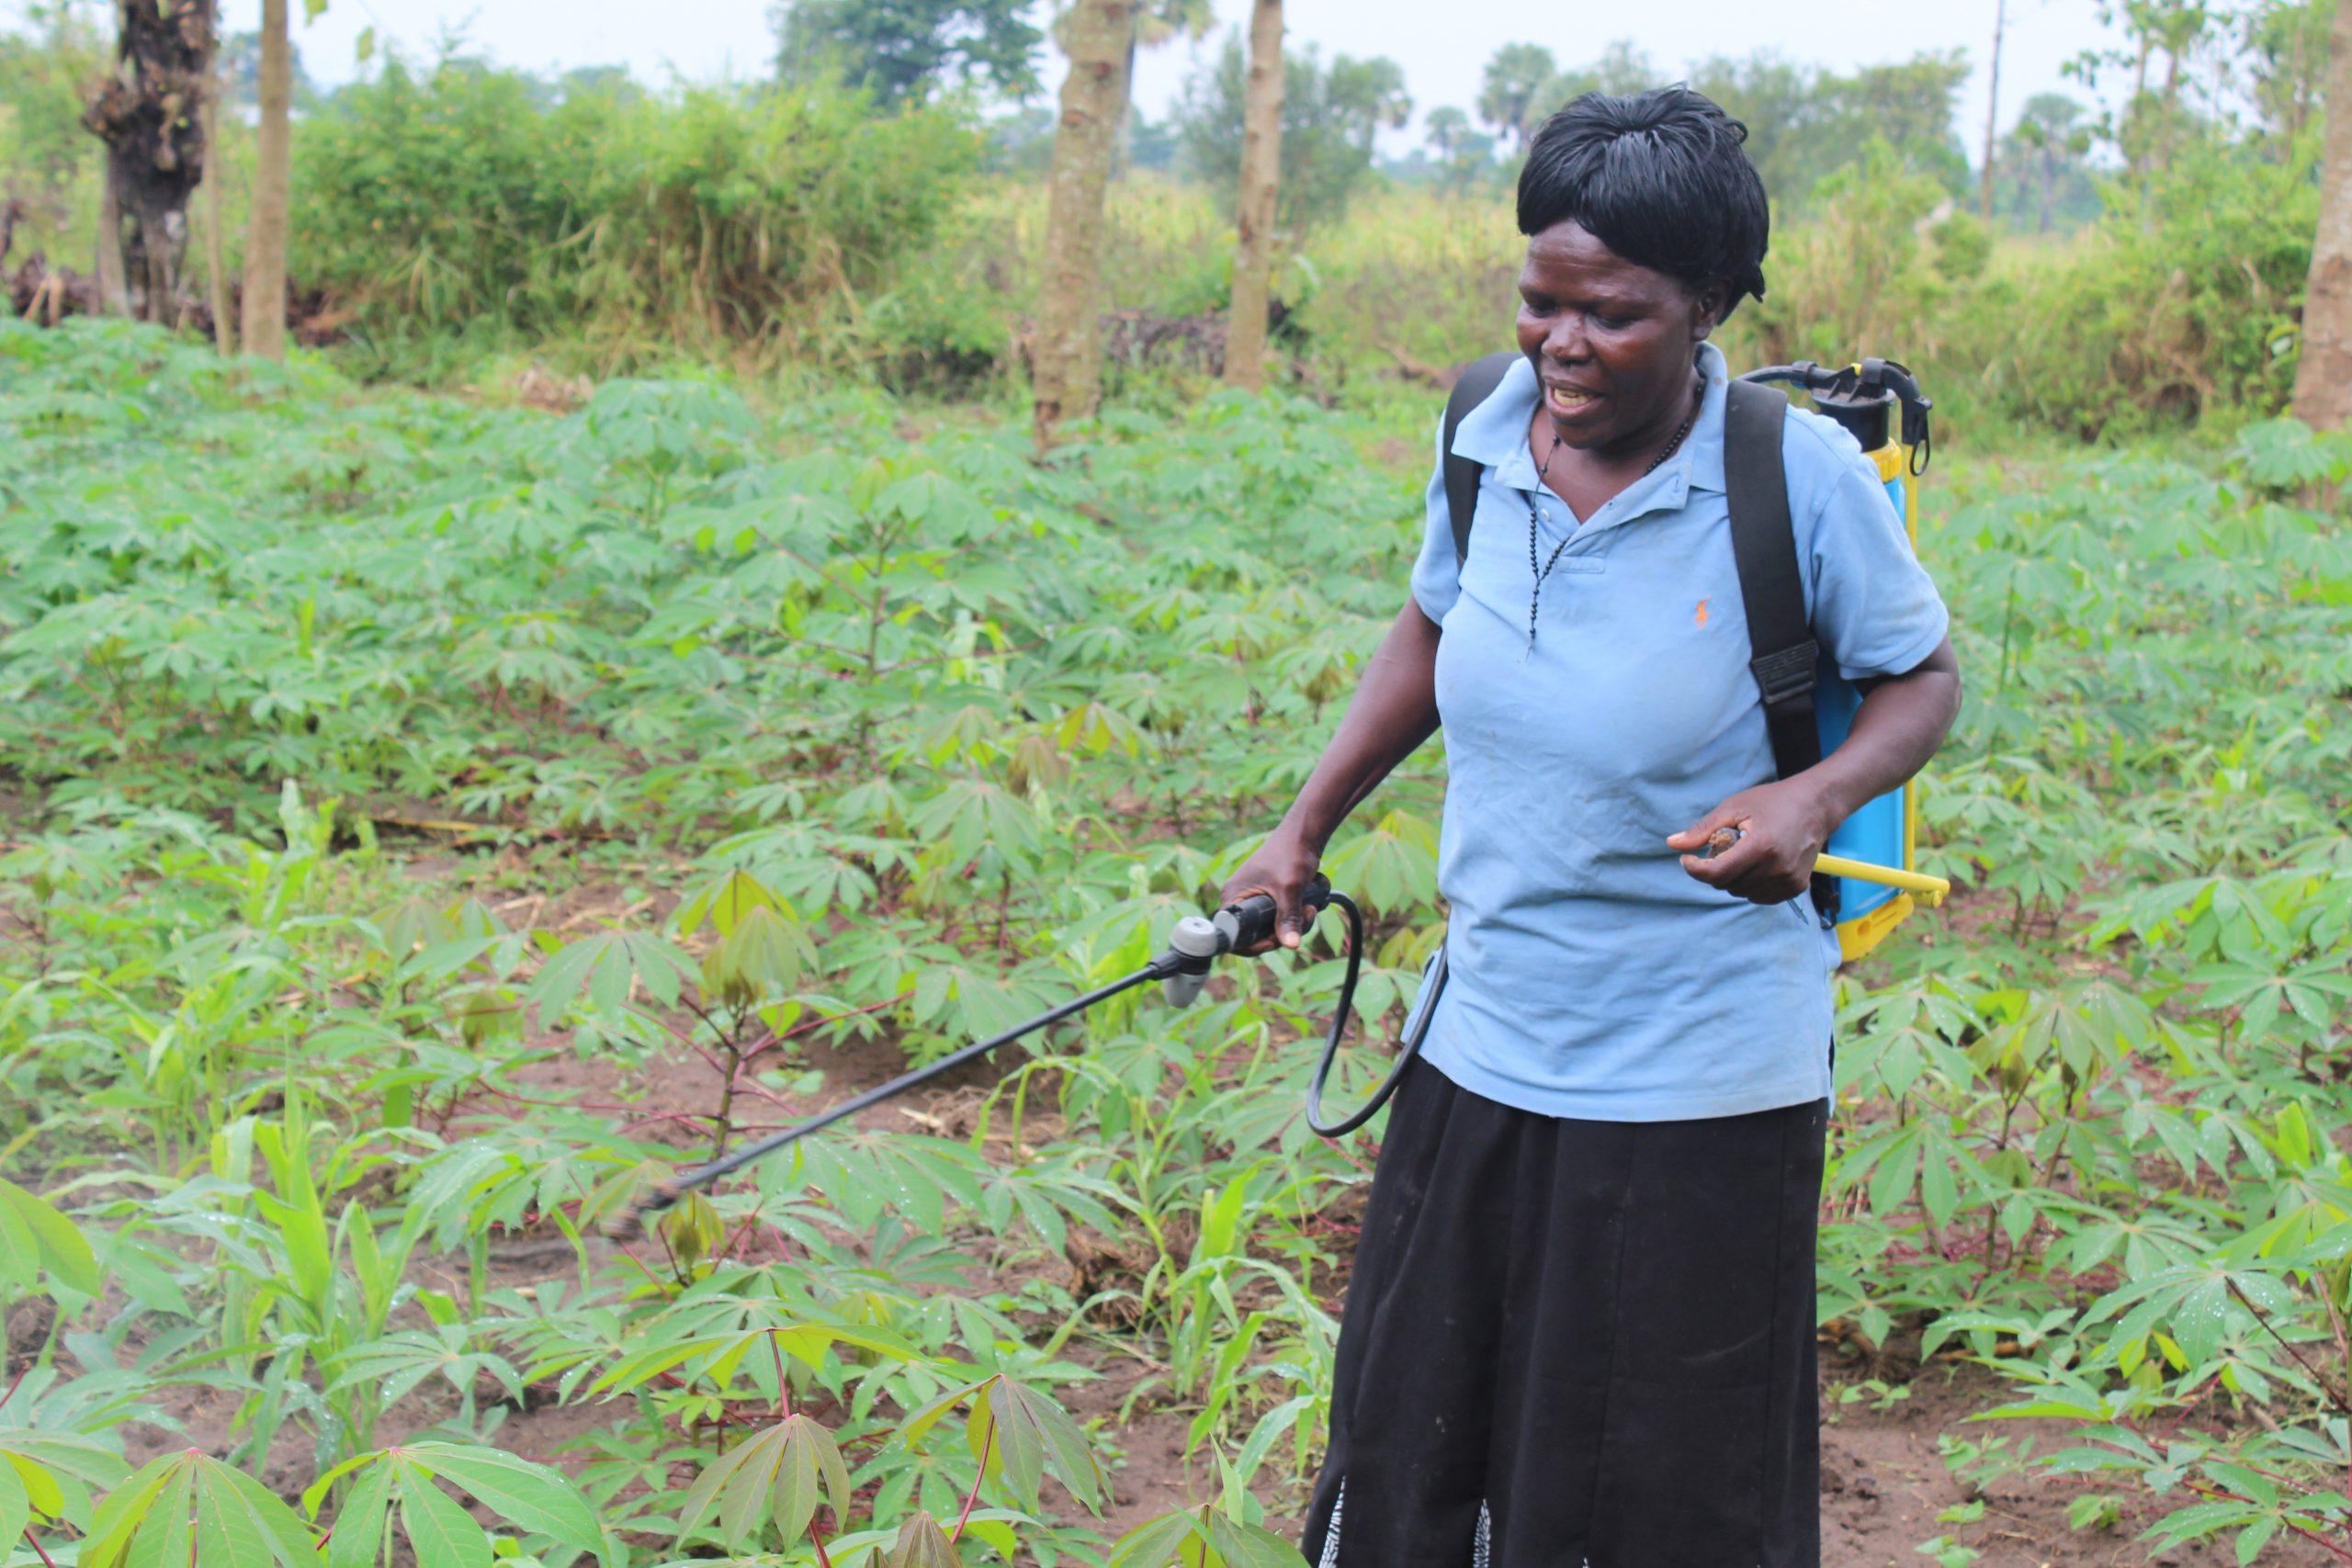 Women spraying her crops